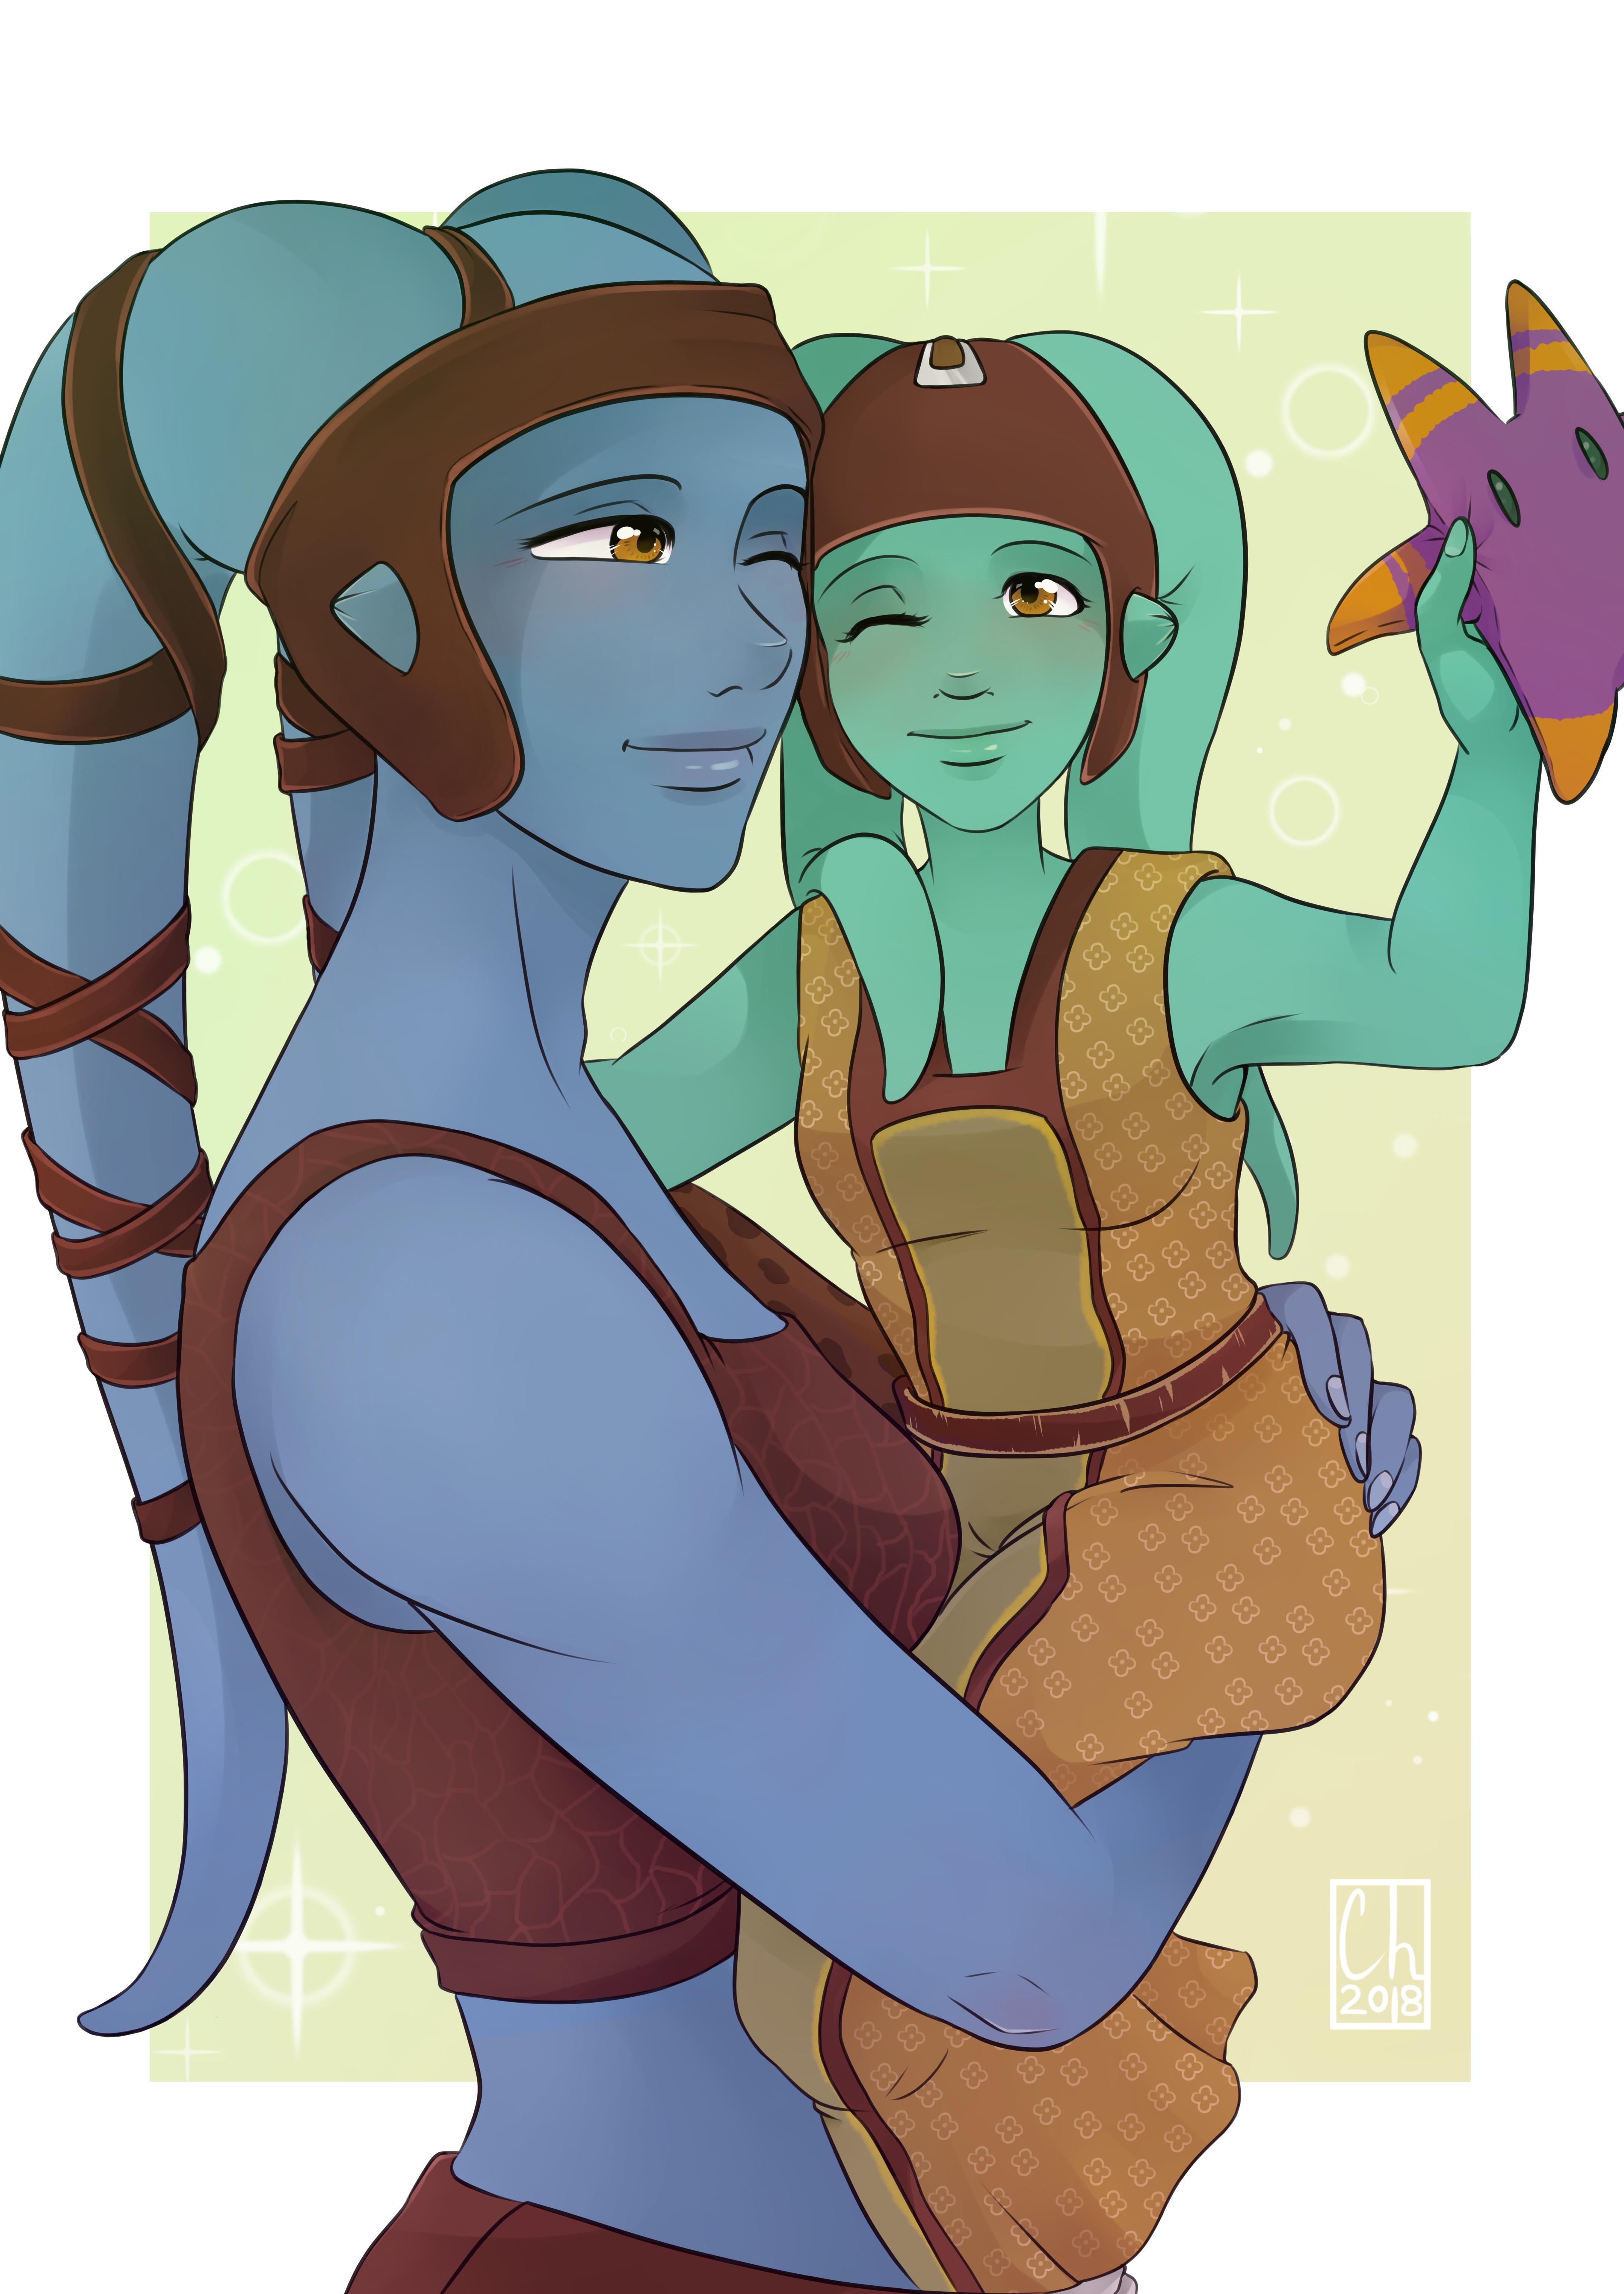 [SW Postcard] - Numa and Aayla Secura by Chyche